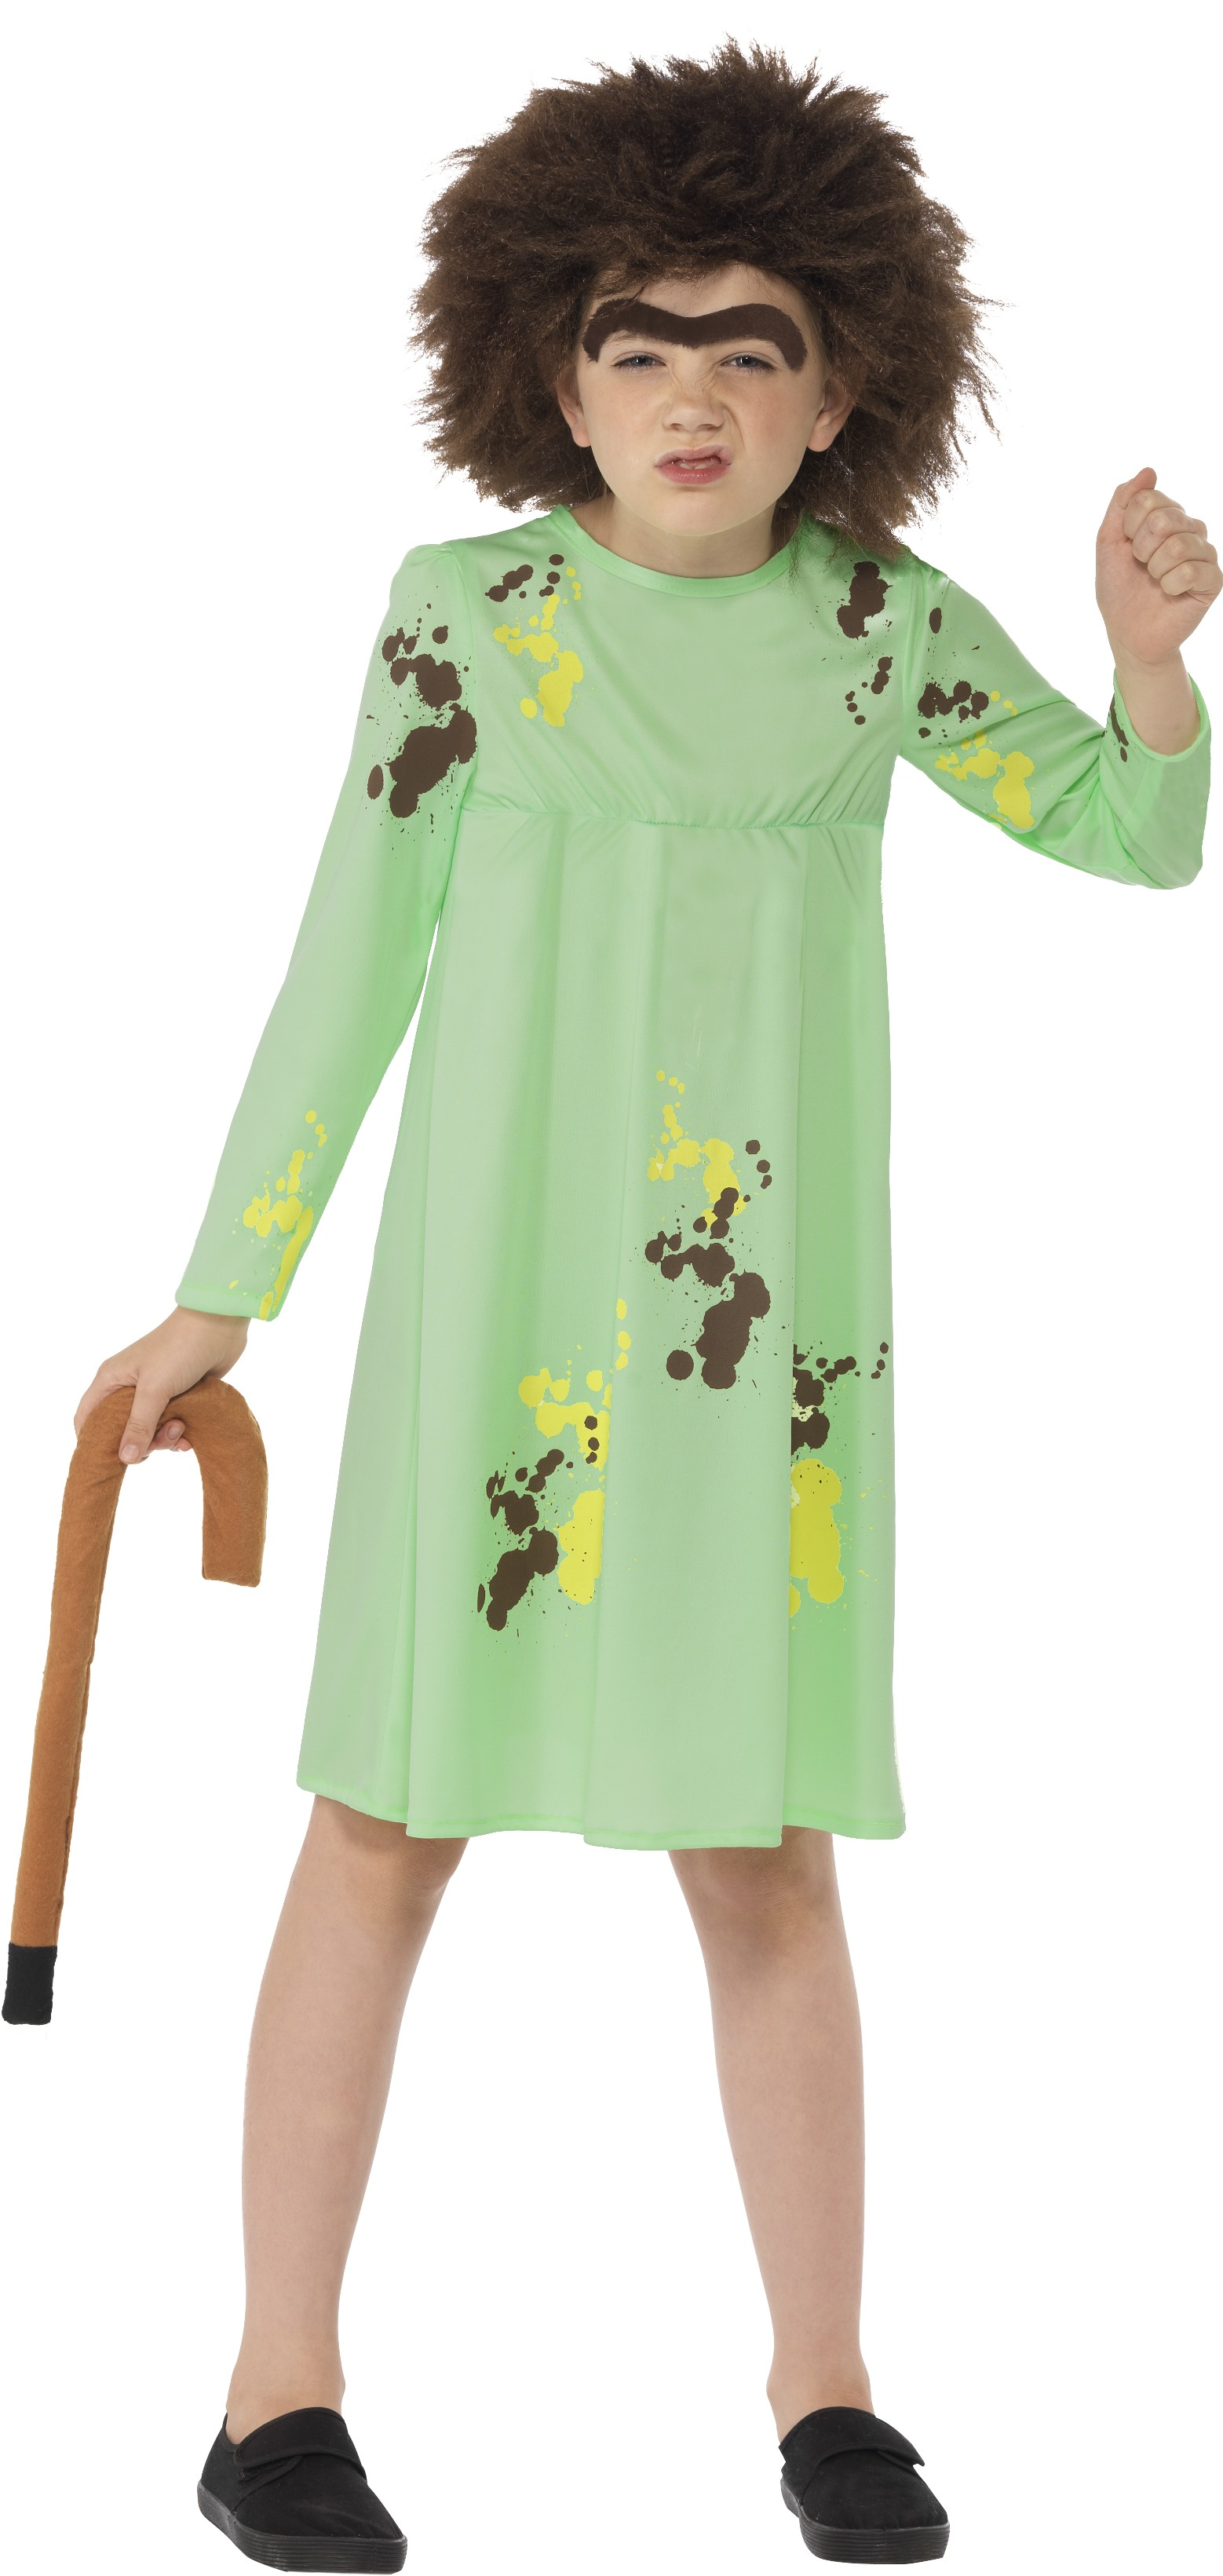 Awesome Roald Dahl Mrs Twit Girls Costume